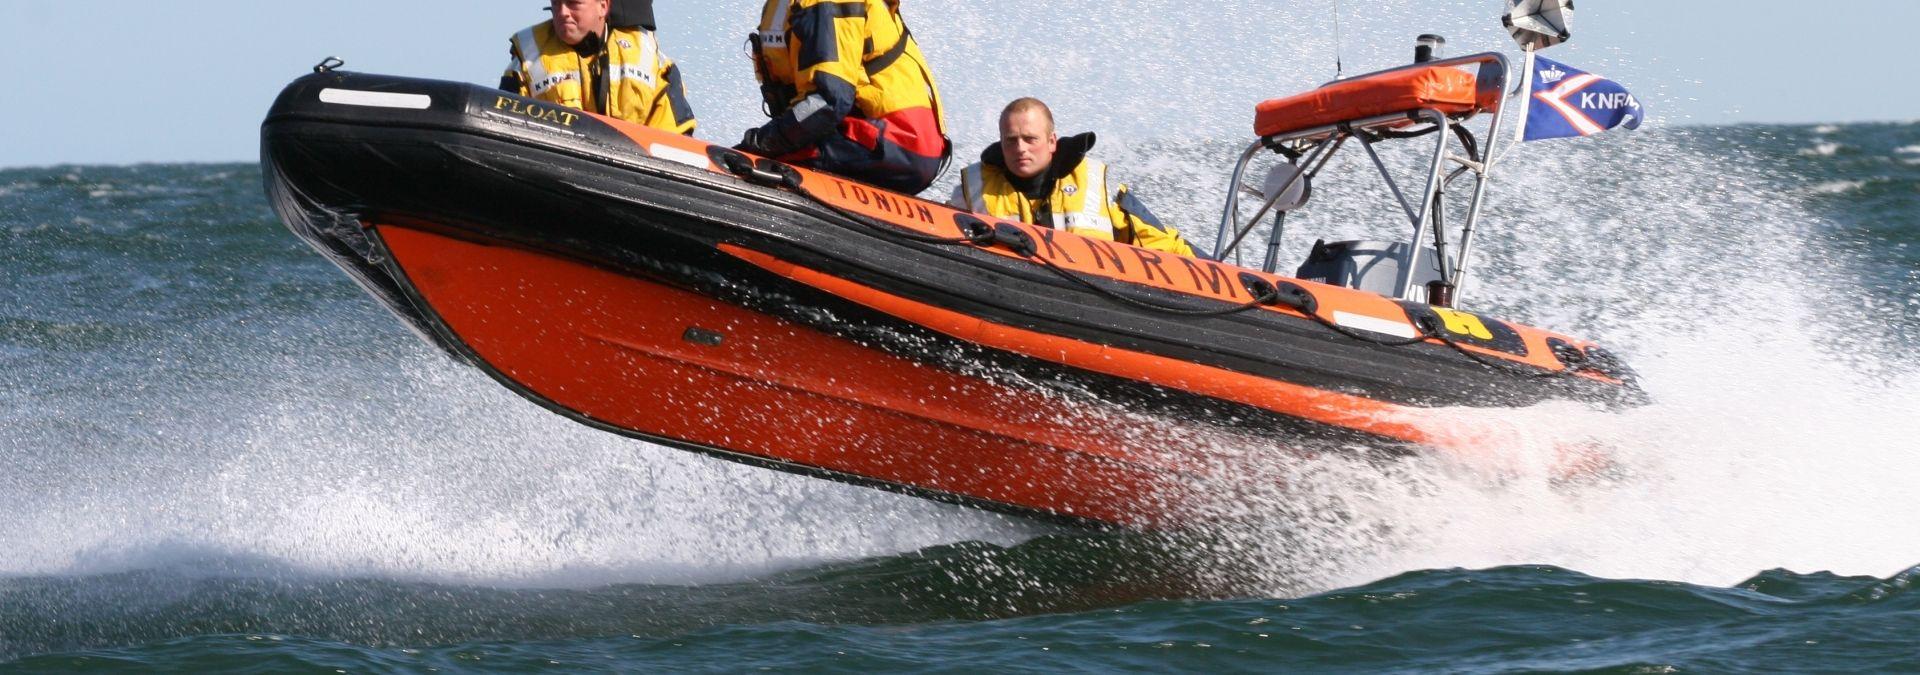 Reddingboot Tonijn